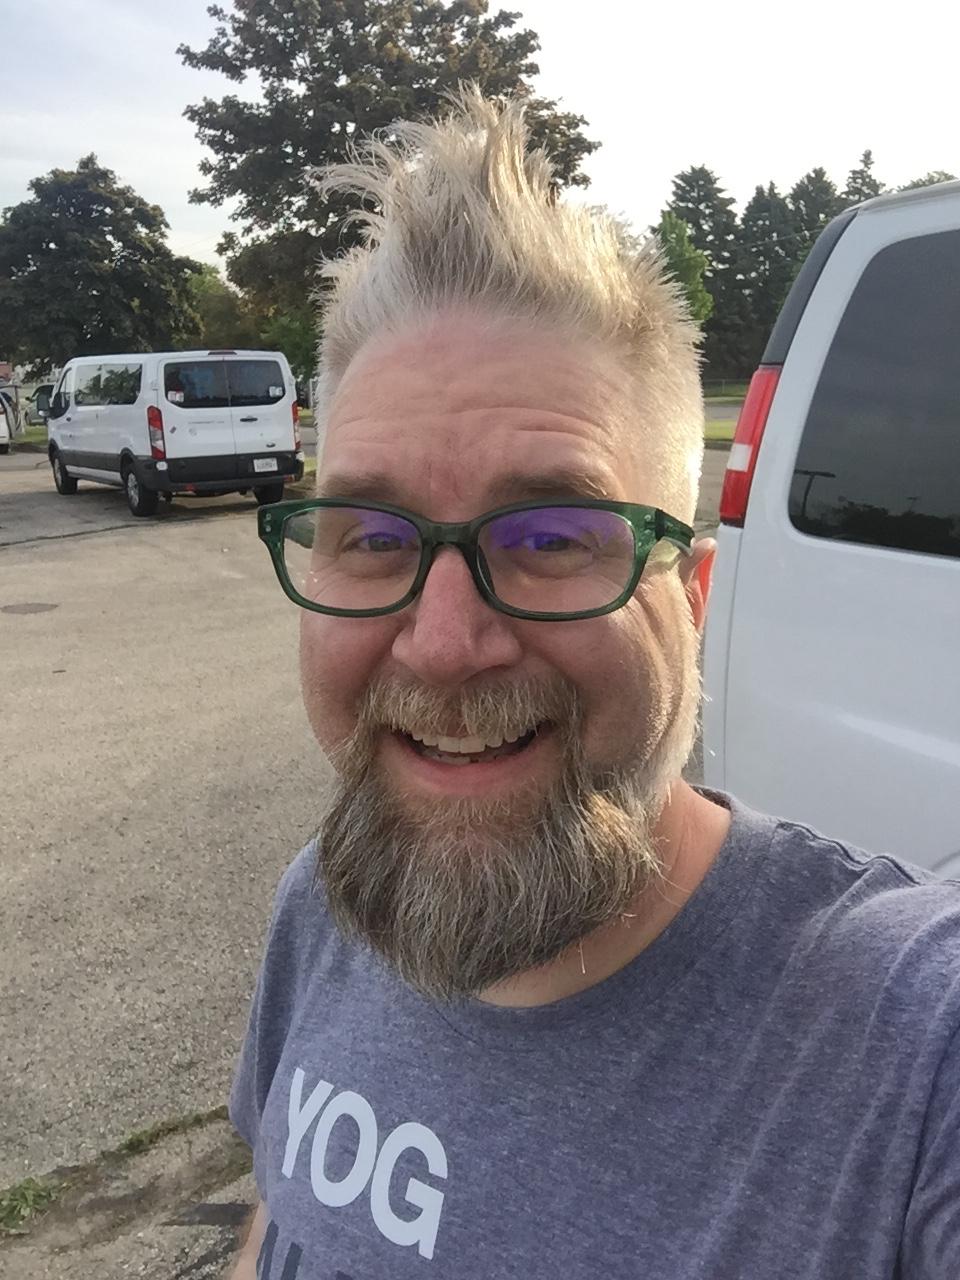 Ragnar - I'm done